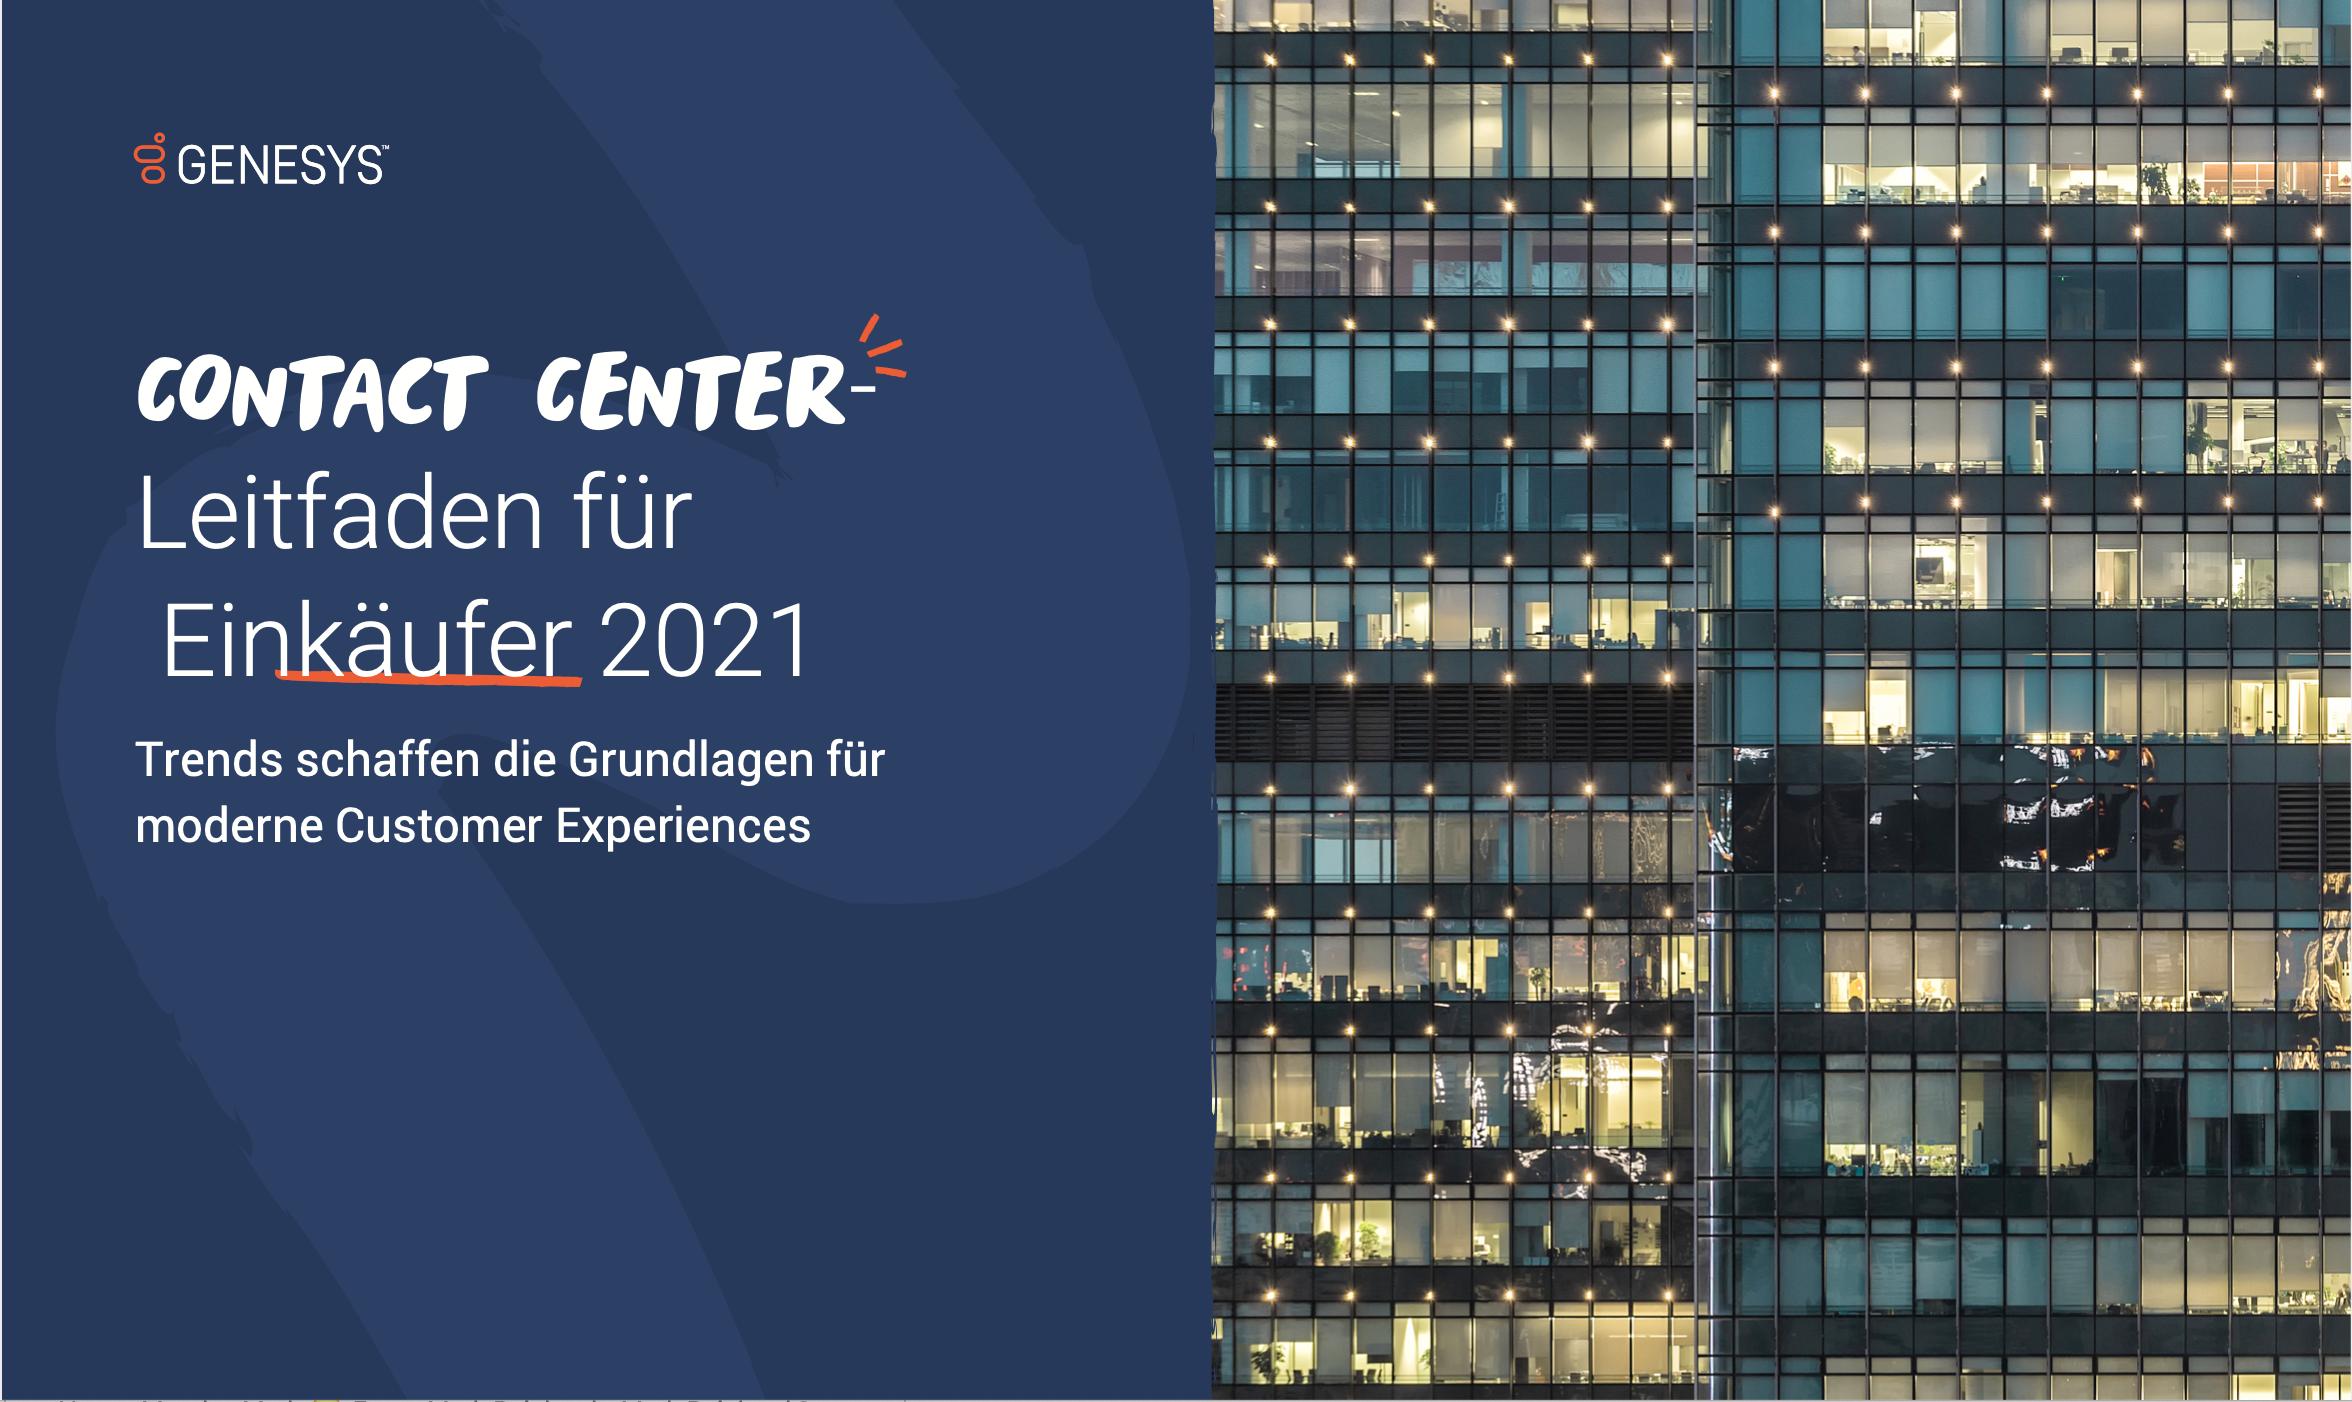 Contact center buyers guide 2021 dach de